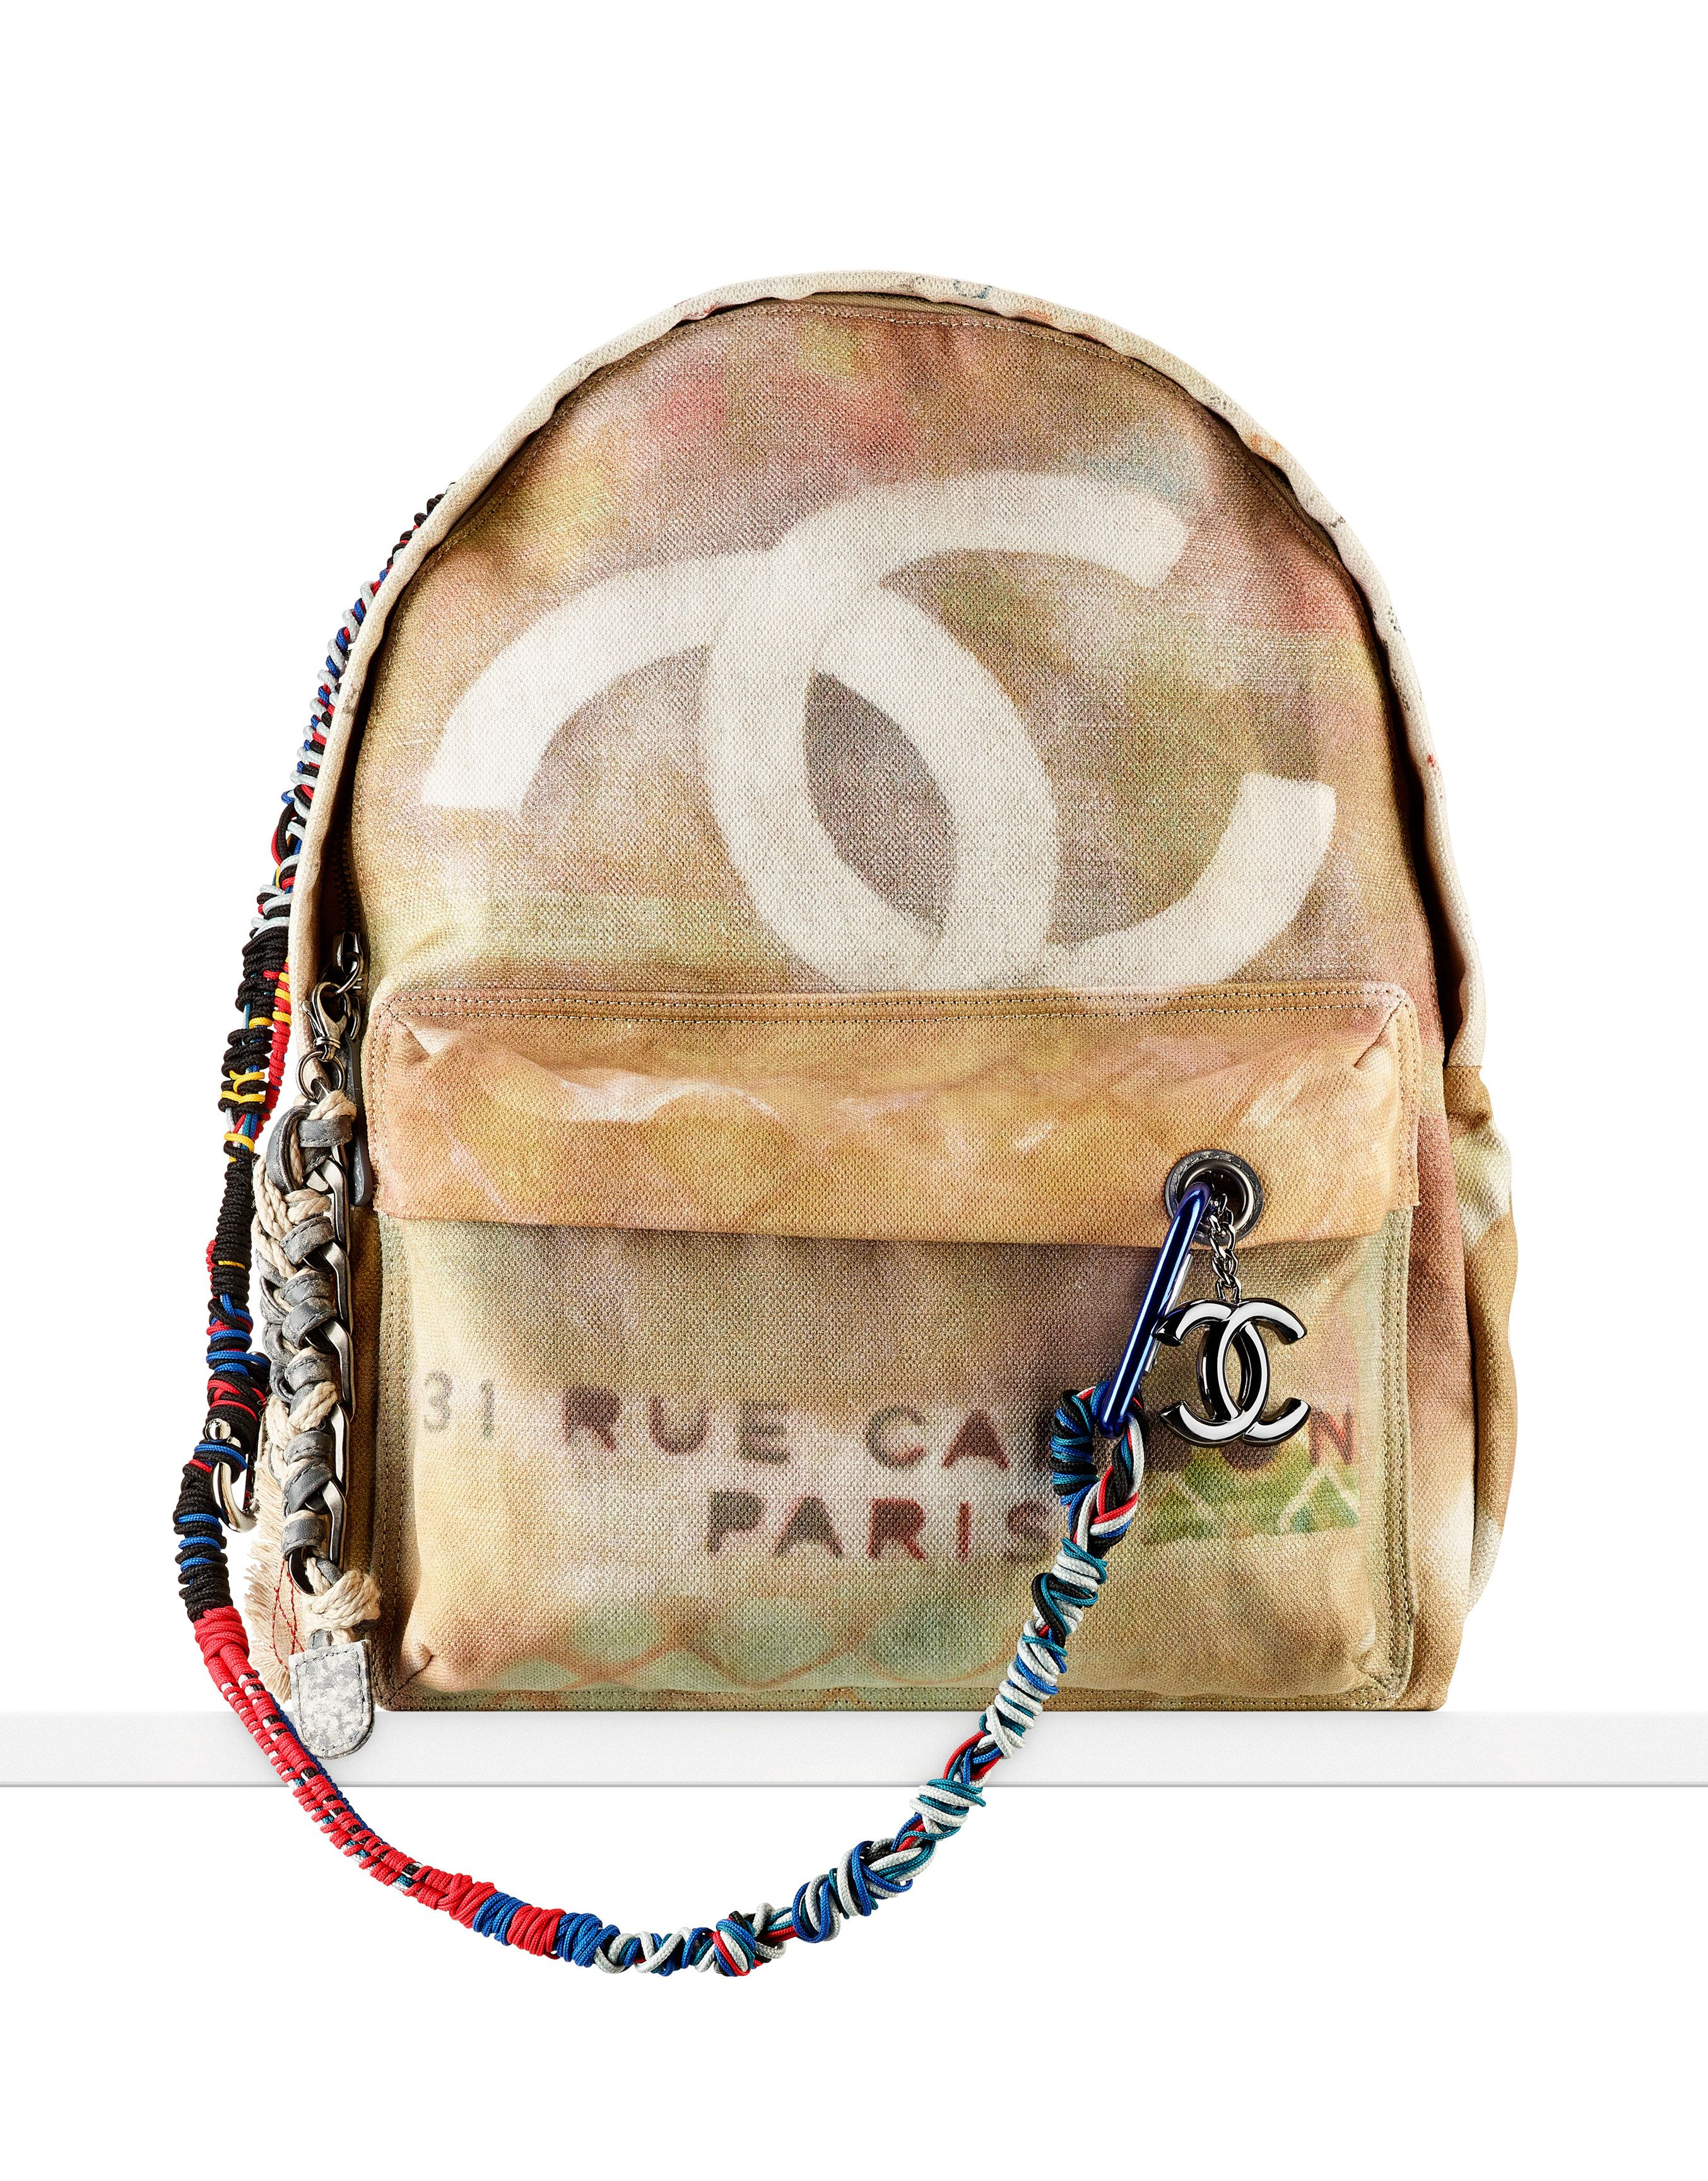 e45853c910 Replica Chanel Graffiti Printed Canvas Backpack- Fenix Toulouse Handball